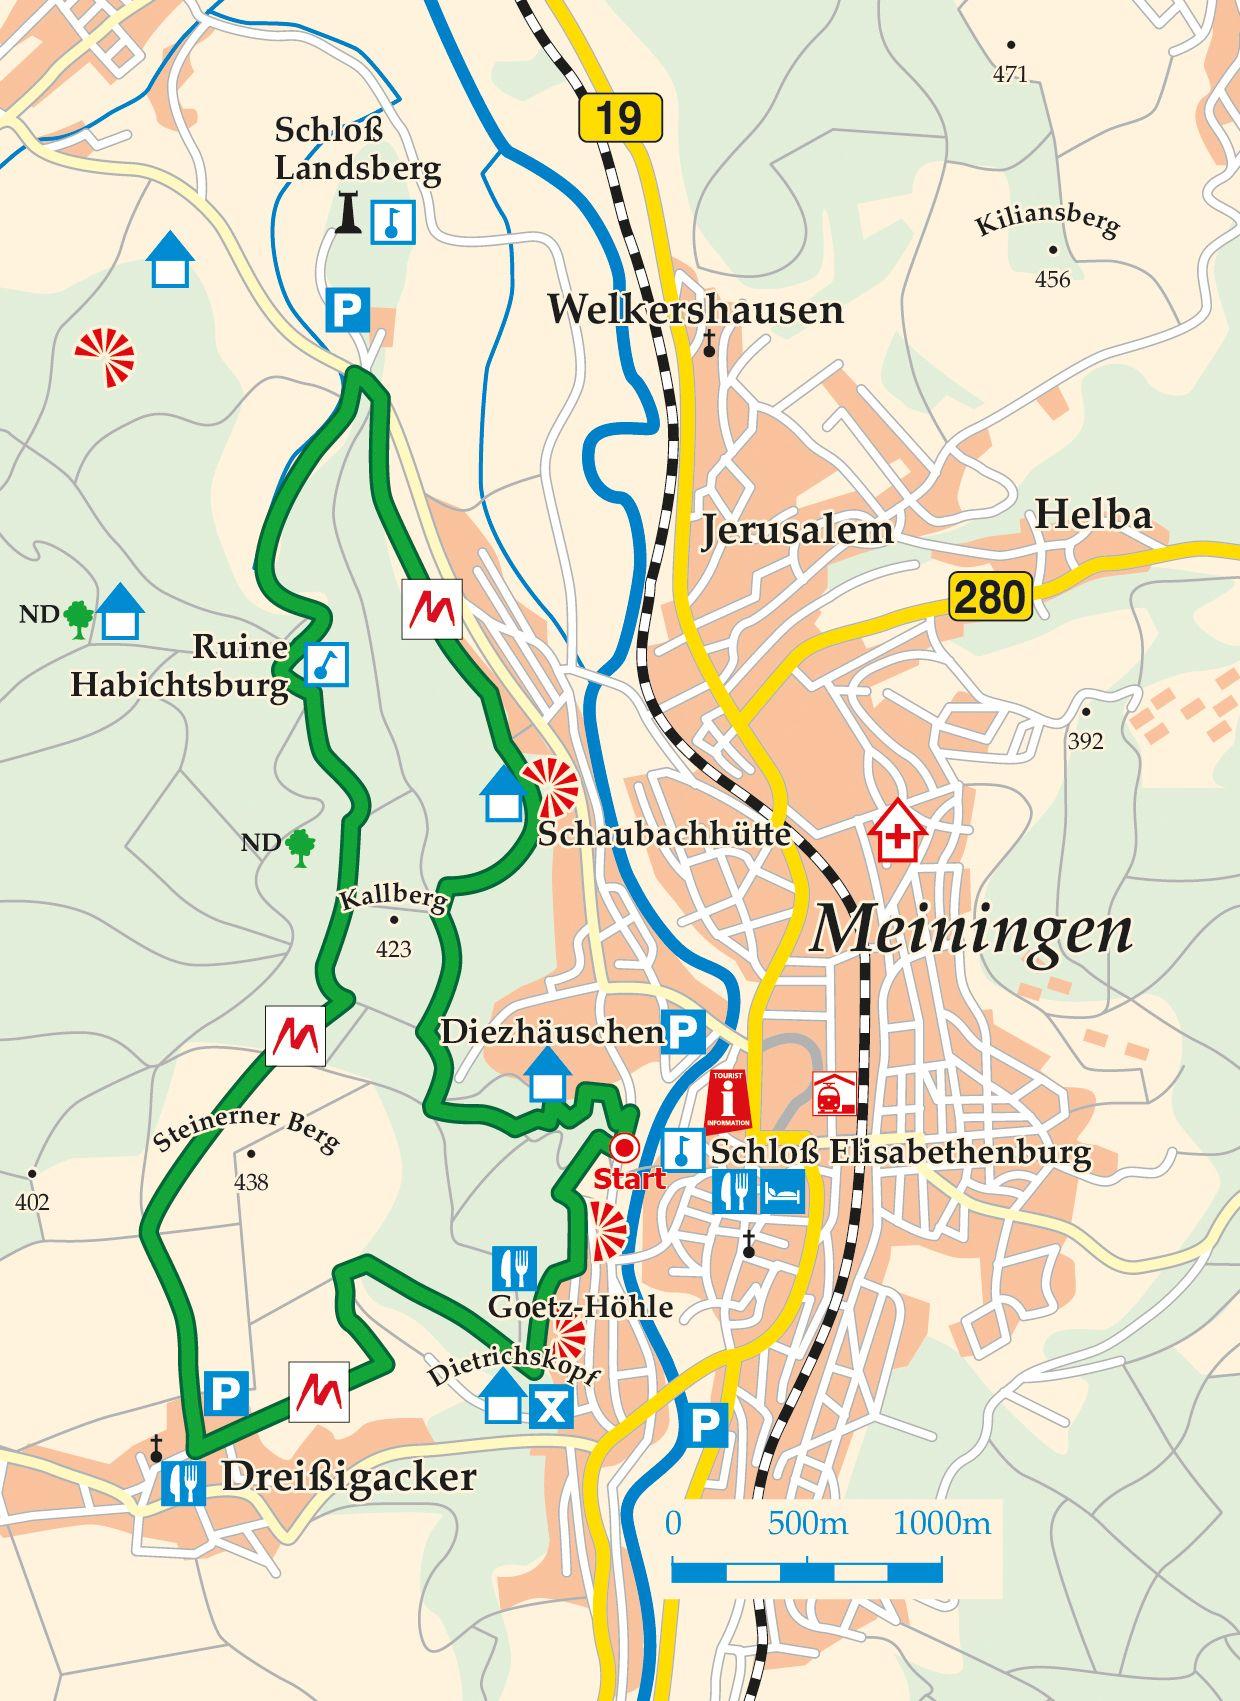 Extratour Der Meininger Karte